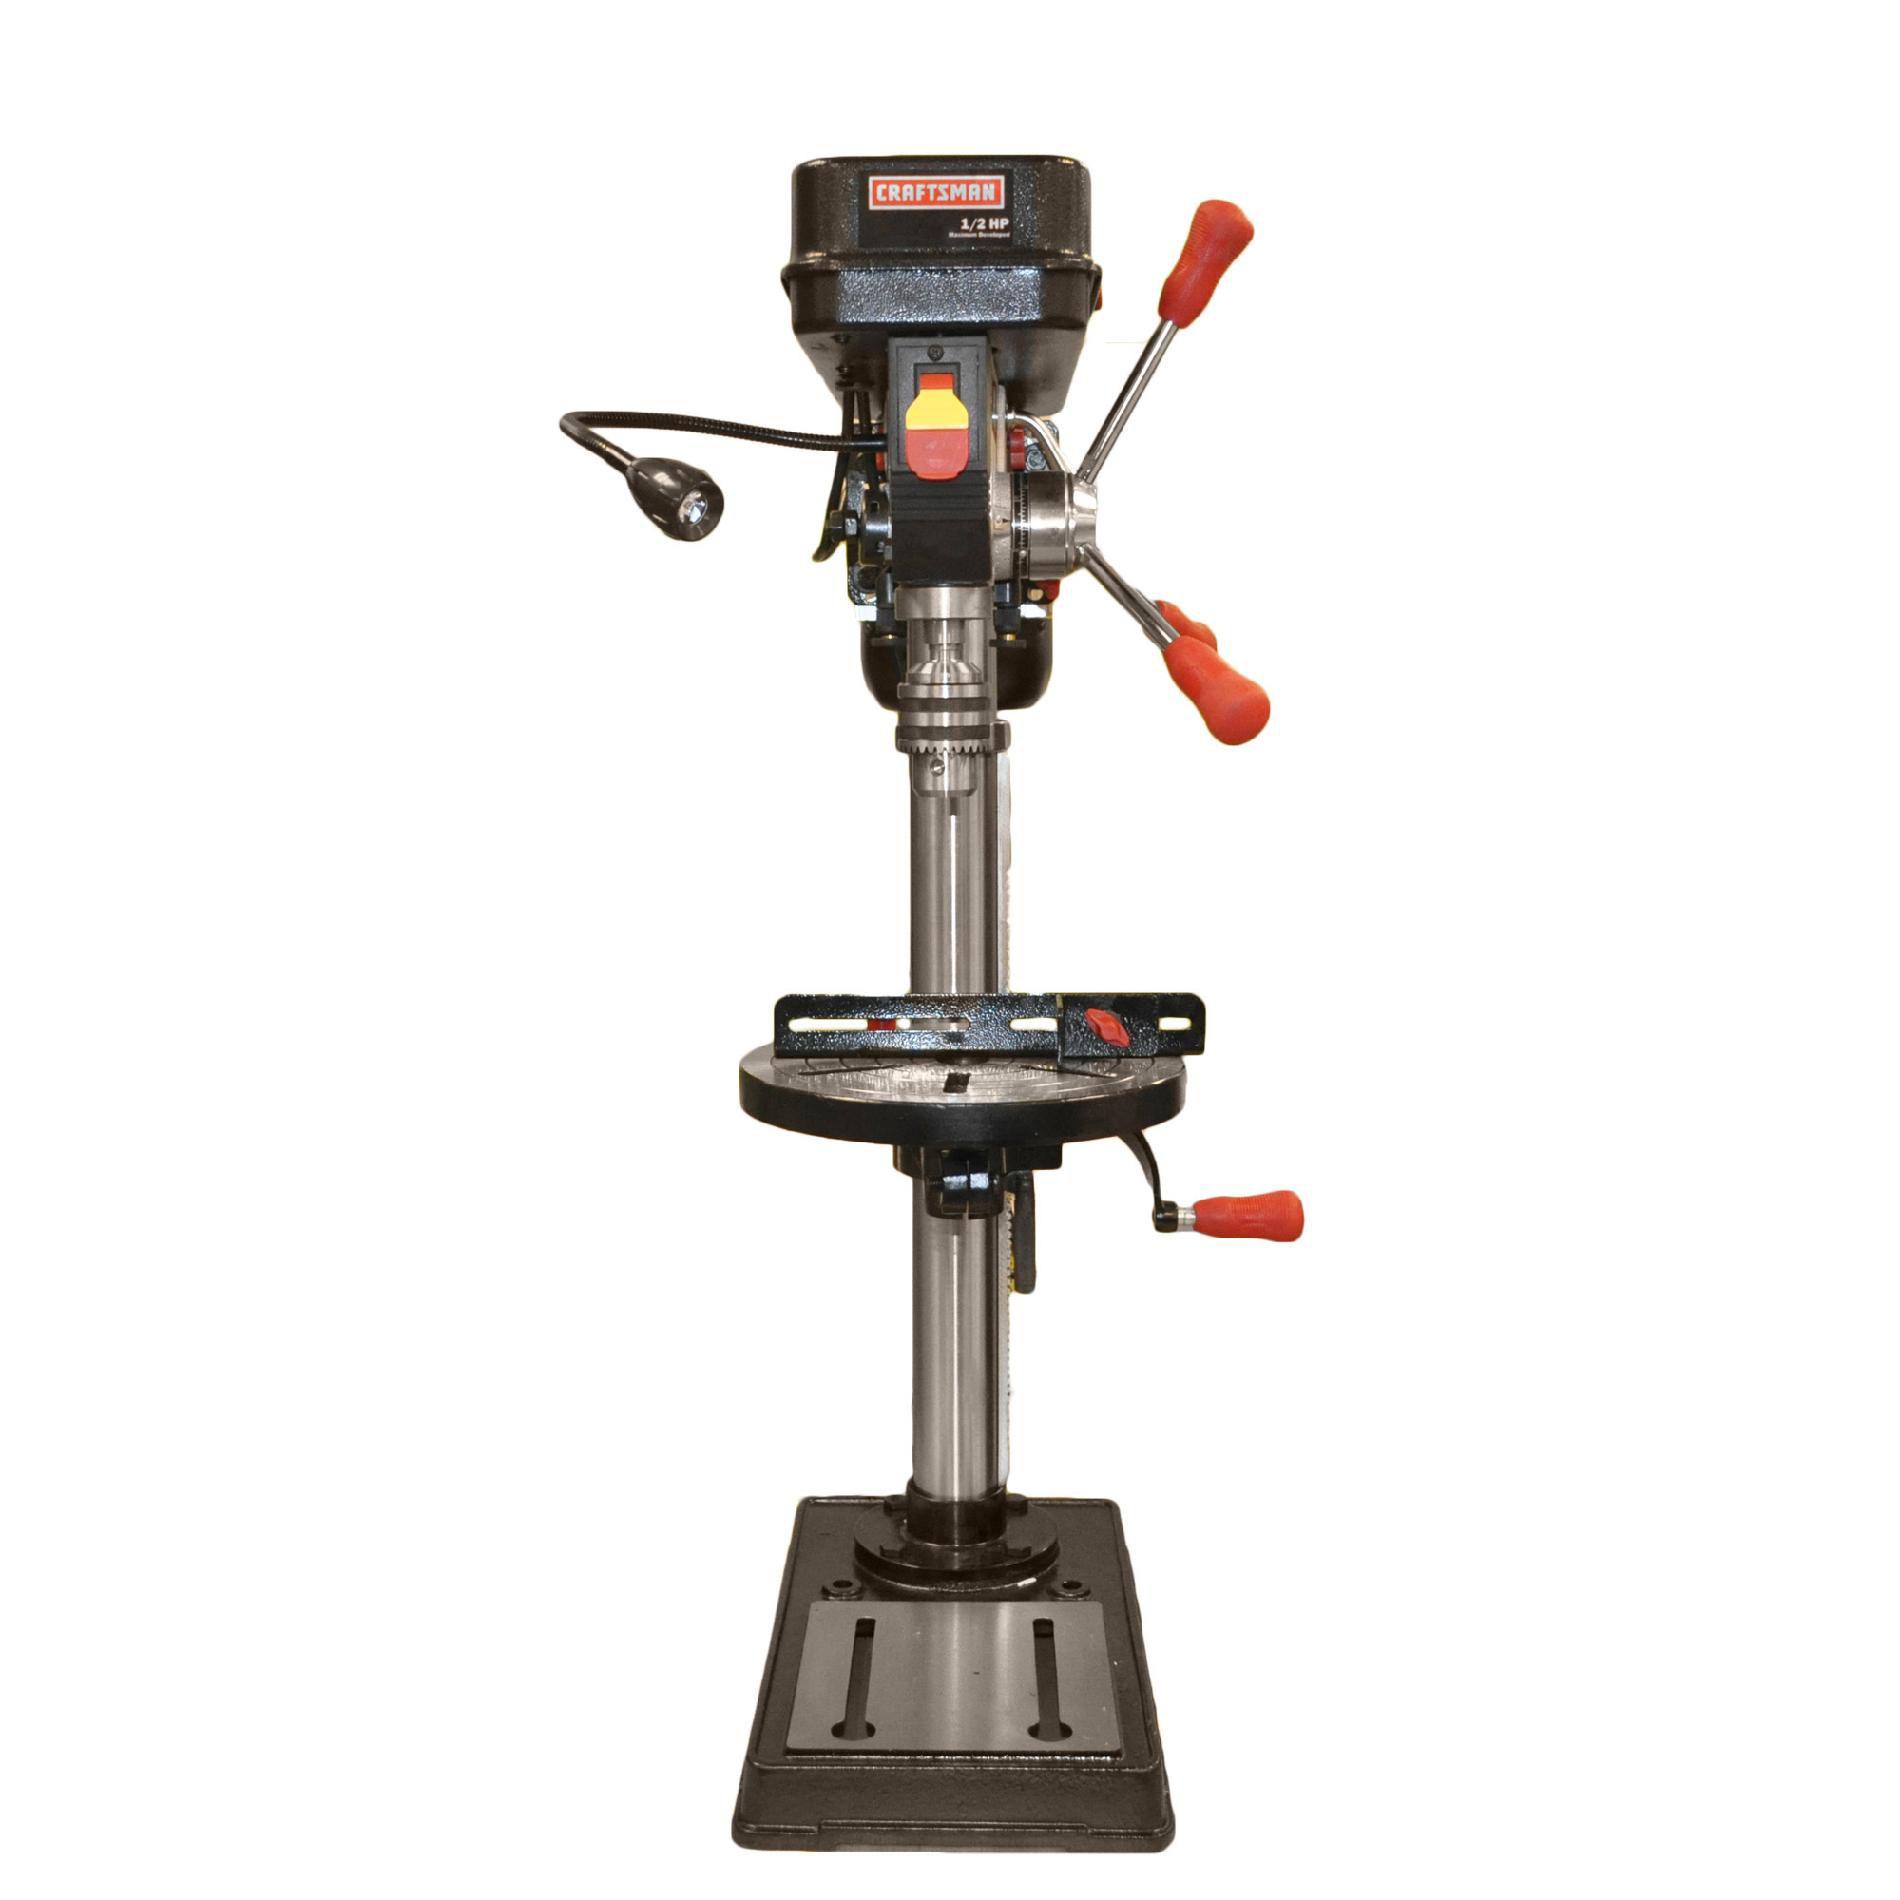 Craftsman Drill Press Belt Adjustment